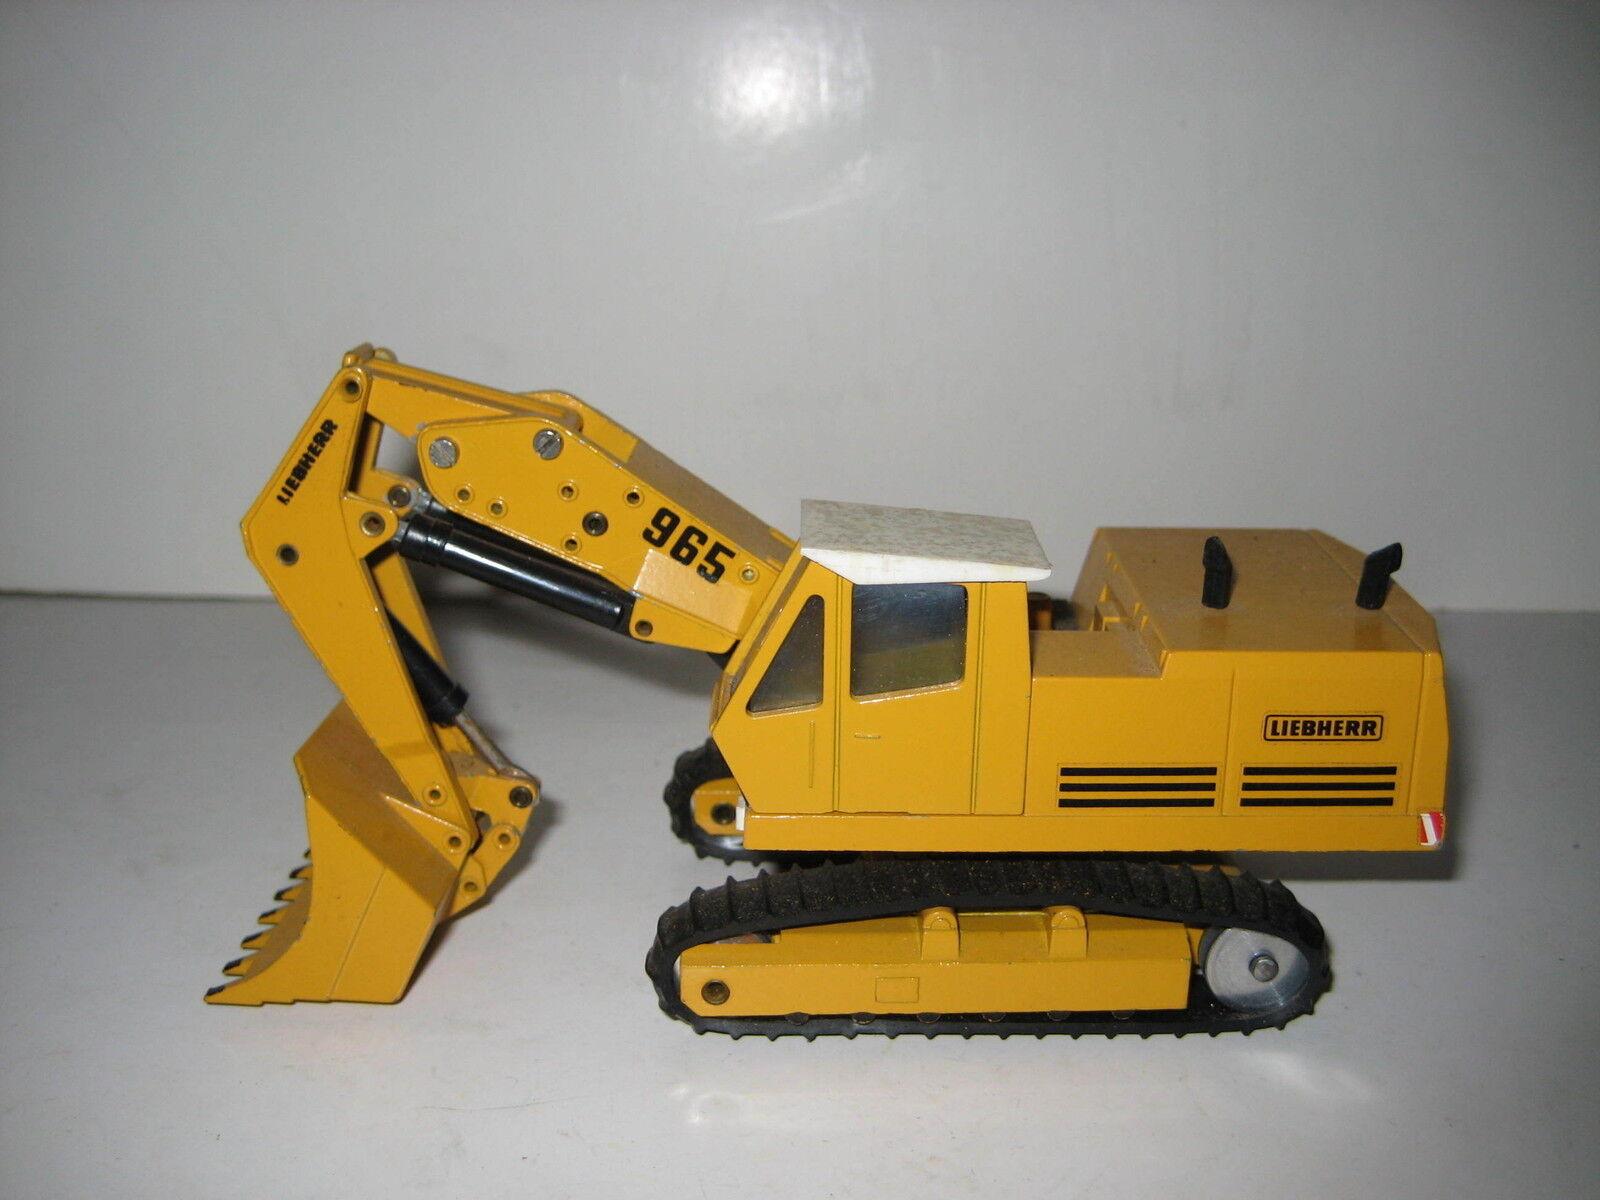 Liebherr R 965 excavadoras alta cuchara orugas  278.2 Gescha 1 50